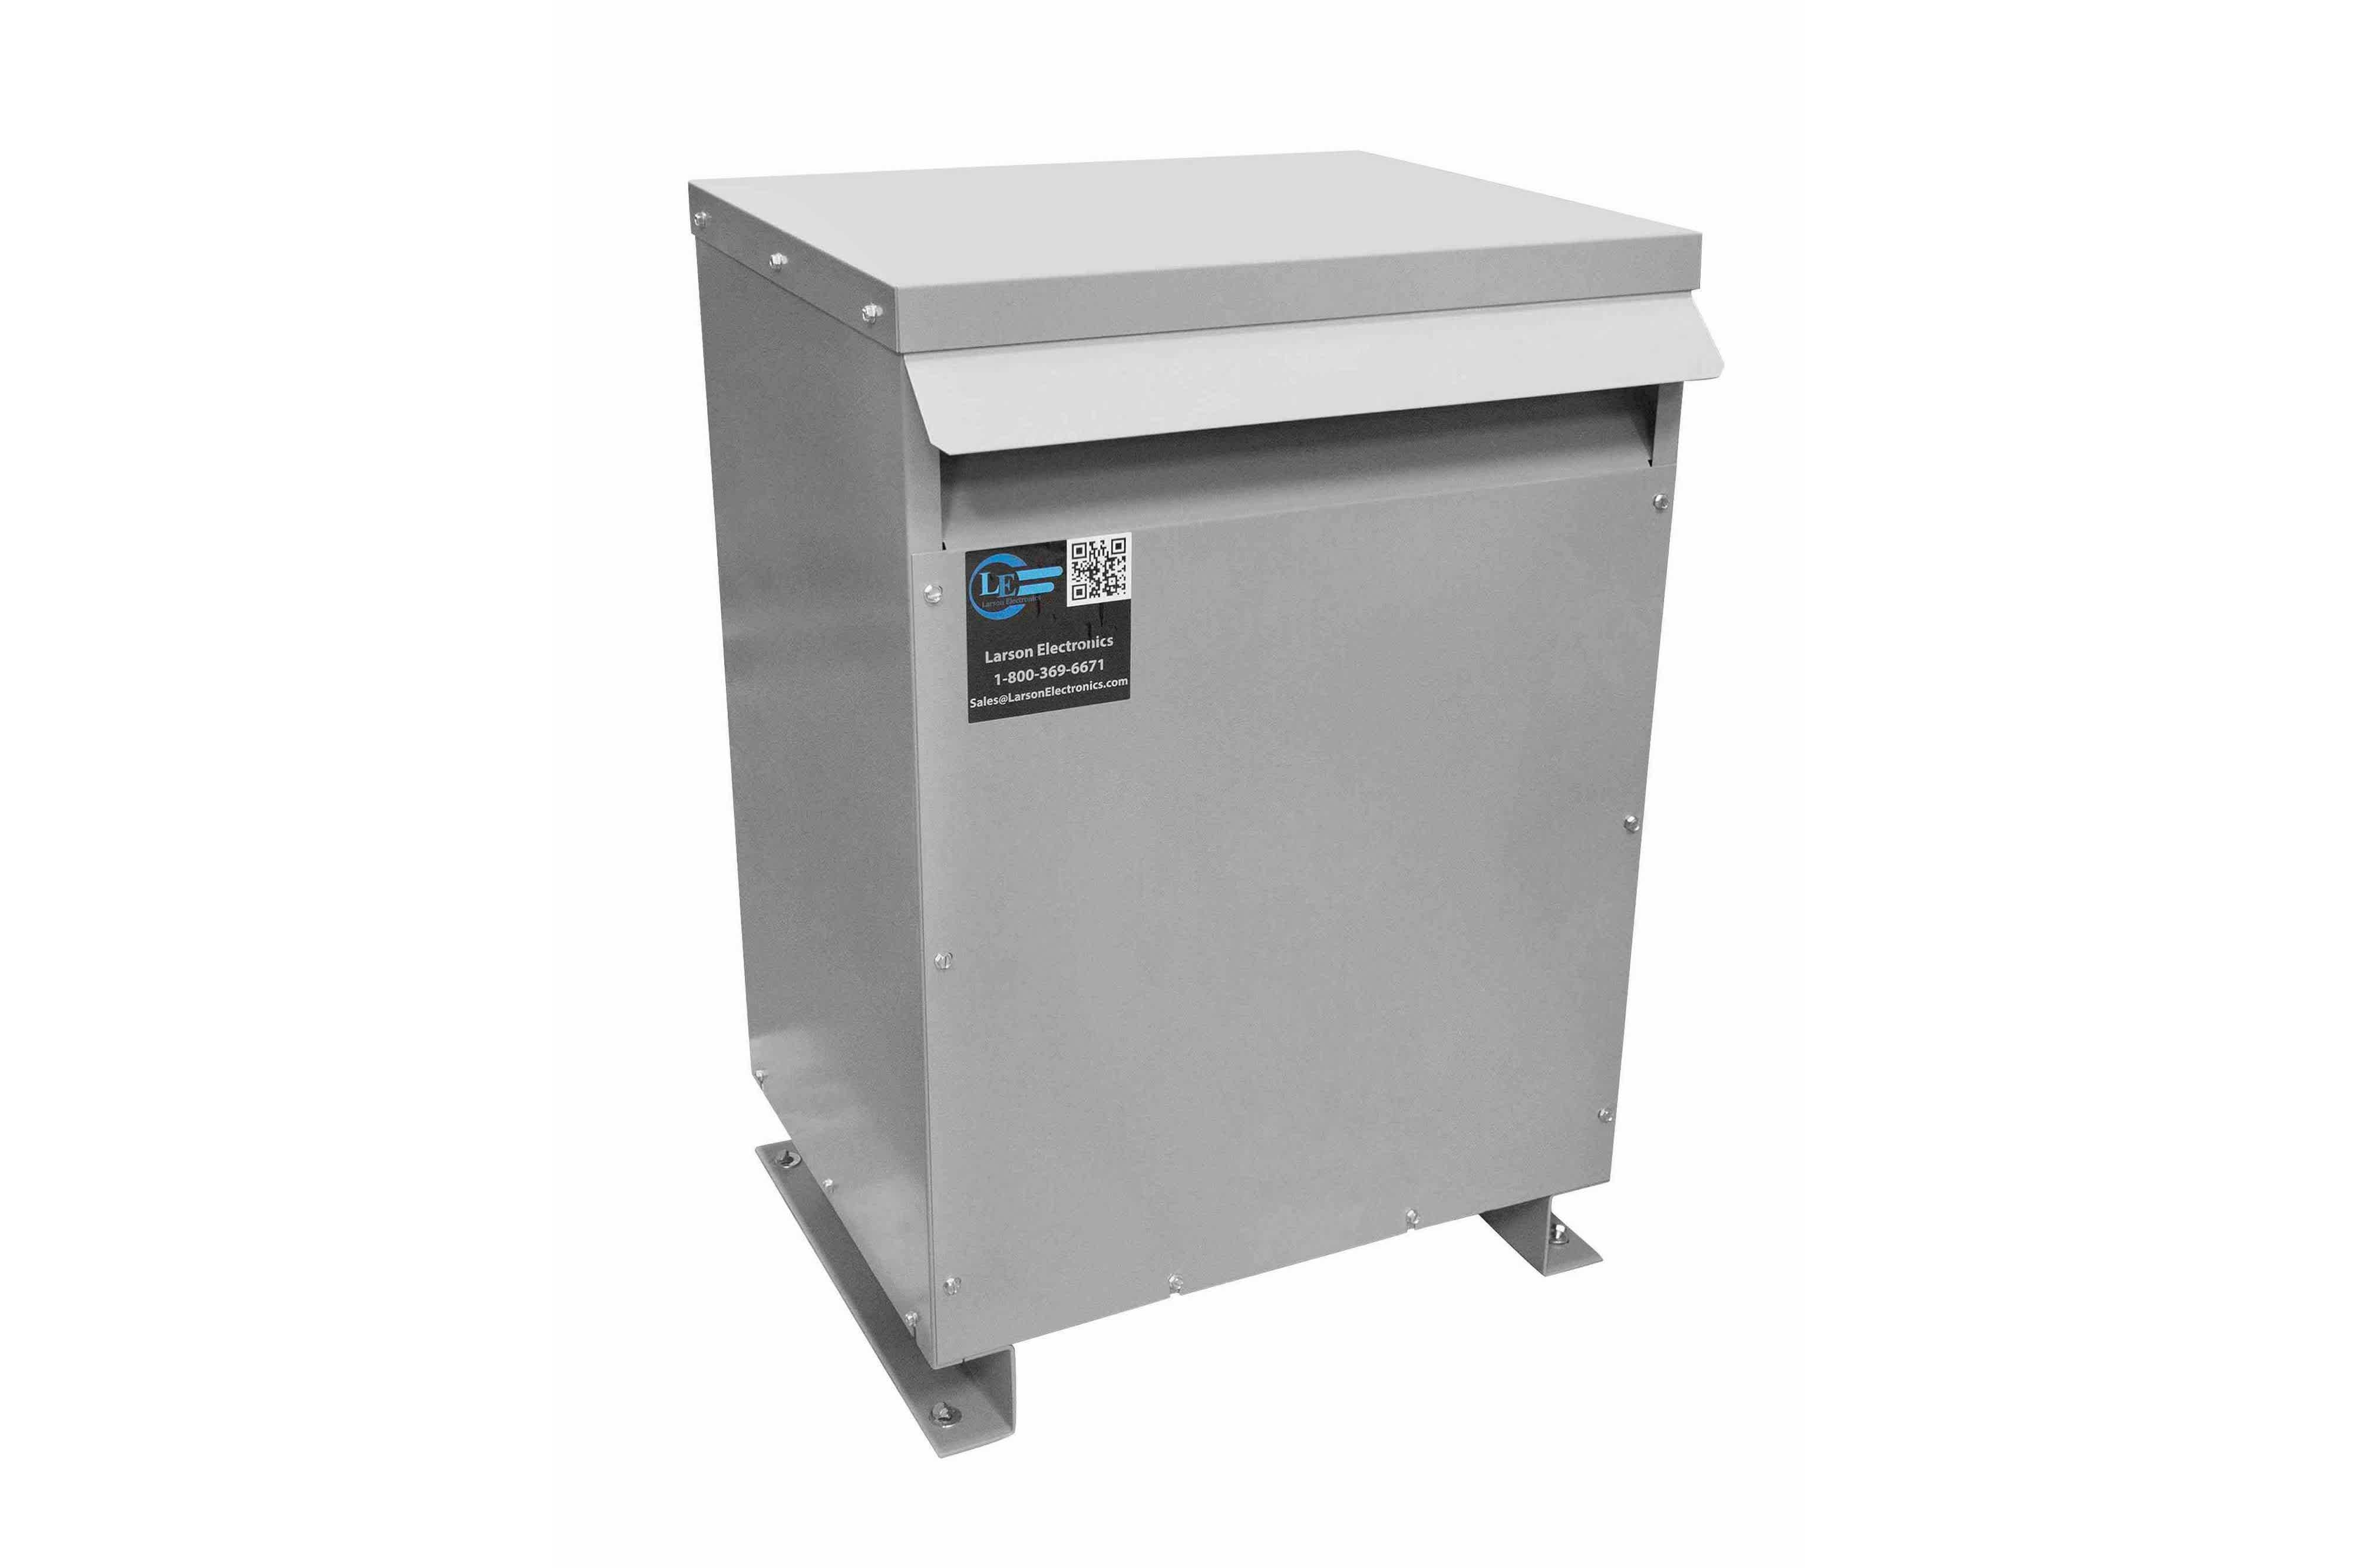 52.5 kVA 3PH Isolation Transformer, 240V Wye Primary, 480Y/277 Wye-N Secondary, N3R, Ventilated, 60 Hz